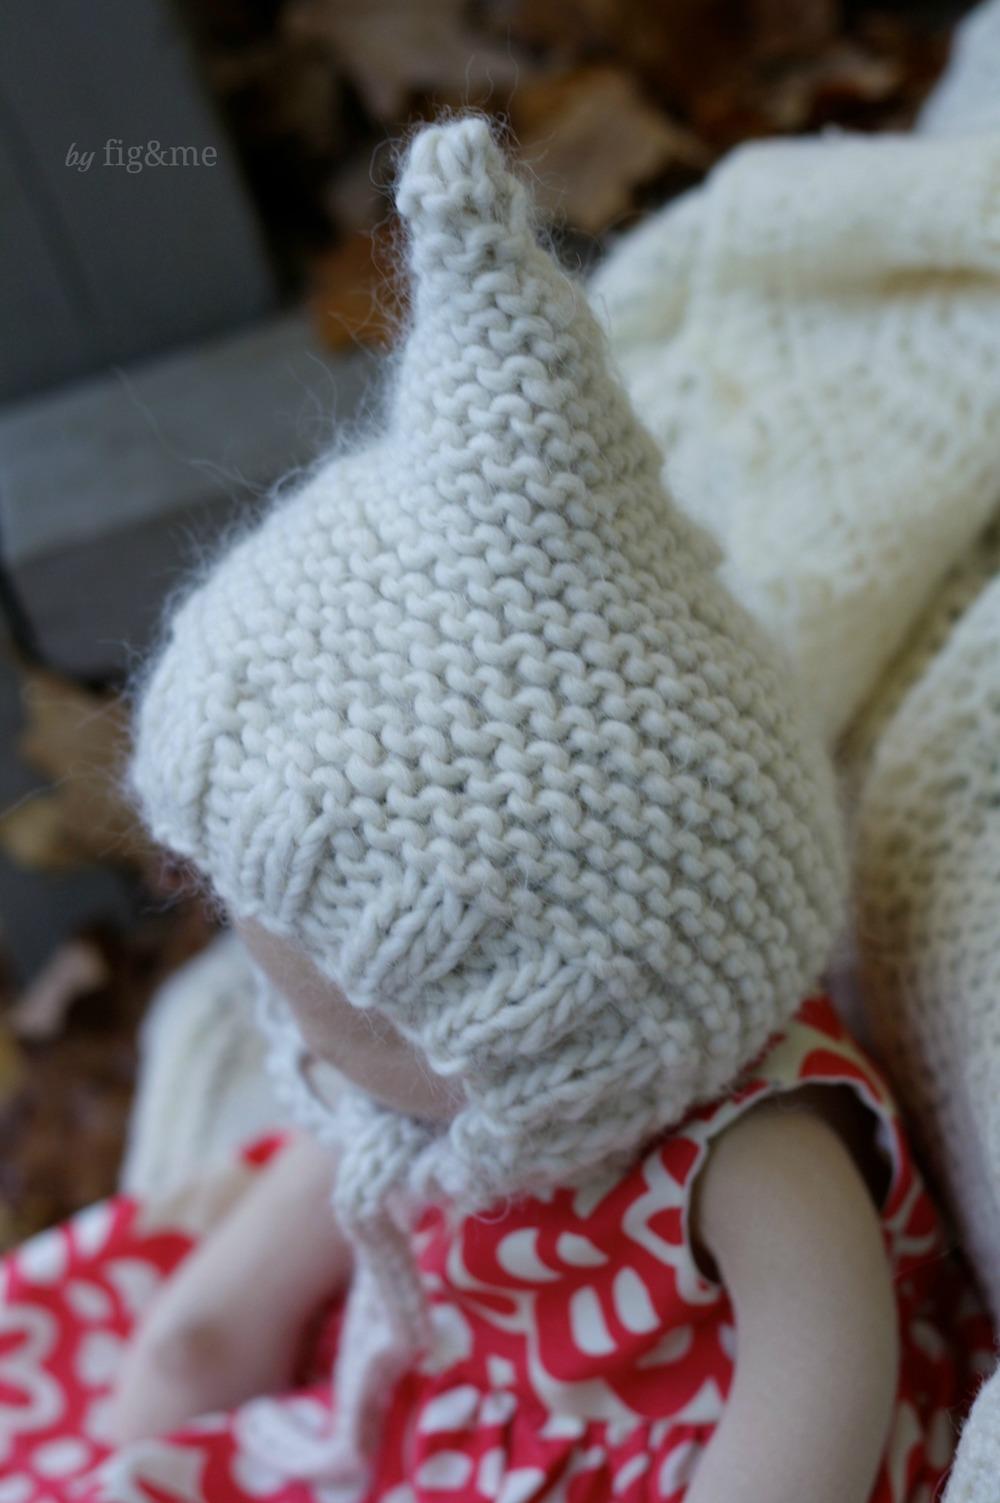 le-fig-knittingpattern-byfigandme.jpg